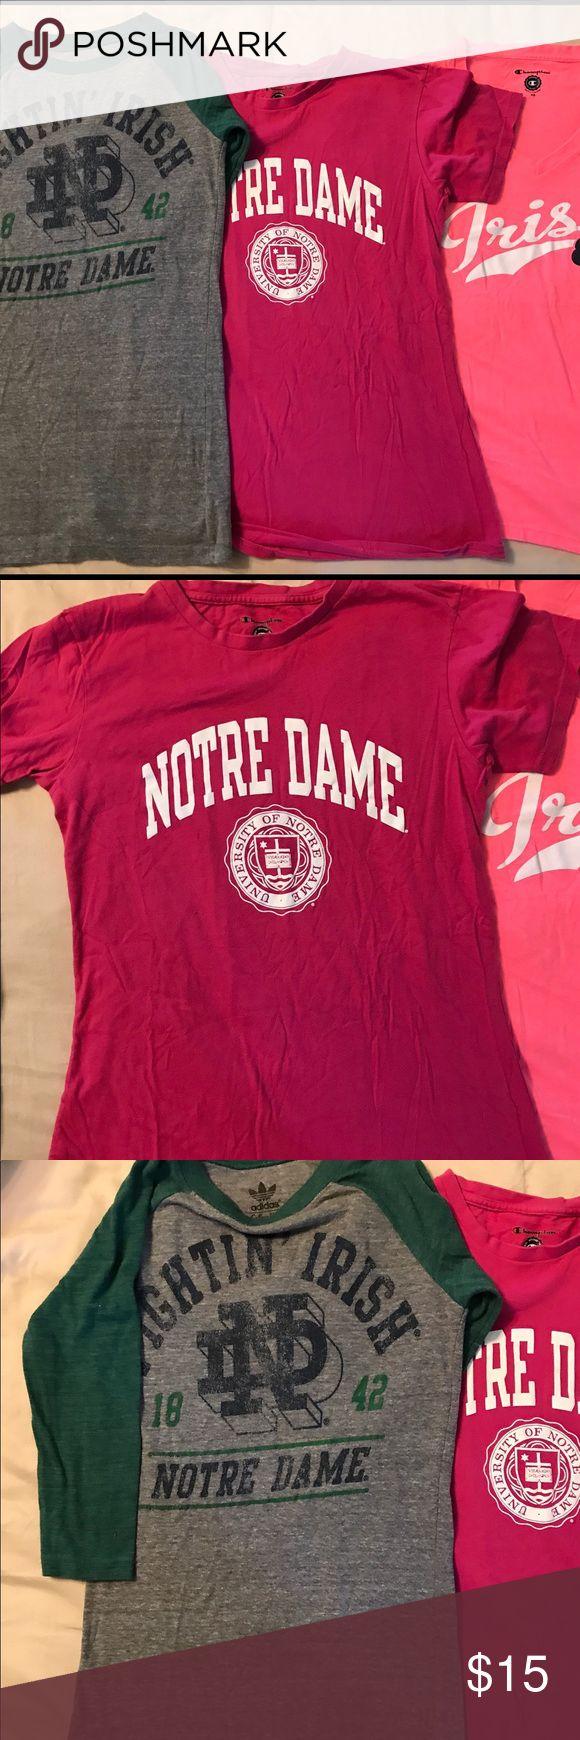 "Three Notre Dame Women's tee-shirts. Adidas XS gray/green, polyester/cotton/rayon blend ""Fightin' Irish"" tee, 3/4 length sleeves. Champion S fuchsia ""Notre Dame"" short sleeve tee, 100% cotton. Champion XS bright pink, short sleeve, fitted ""Irish"" tee, polyester/cotton. adidas Tops Tees - Short Sleeve"